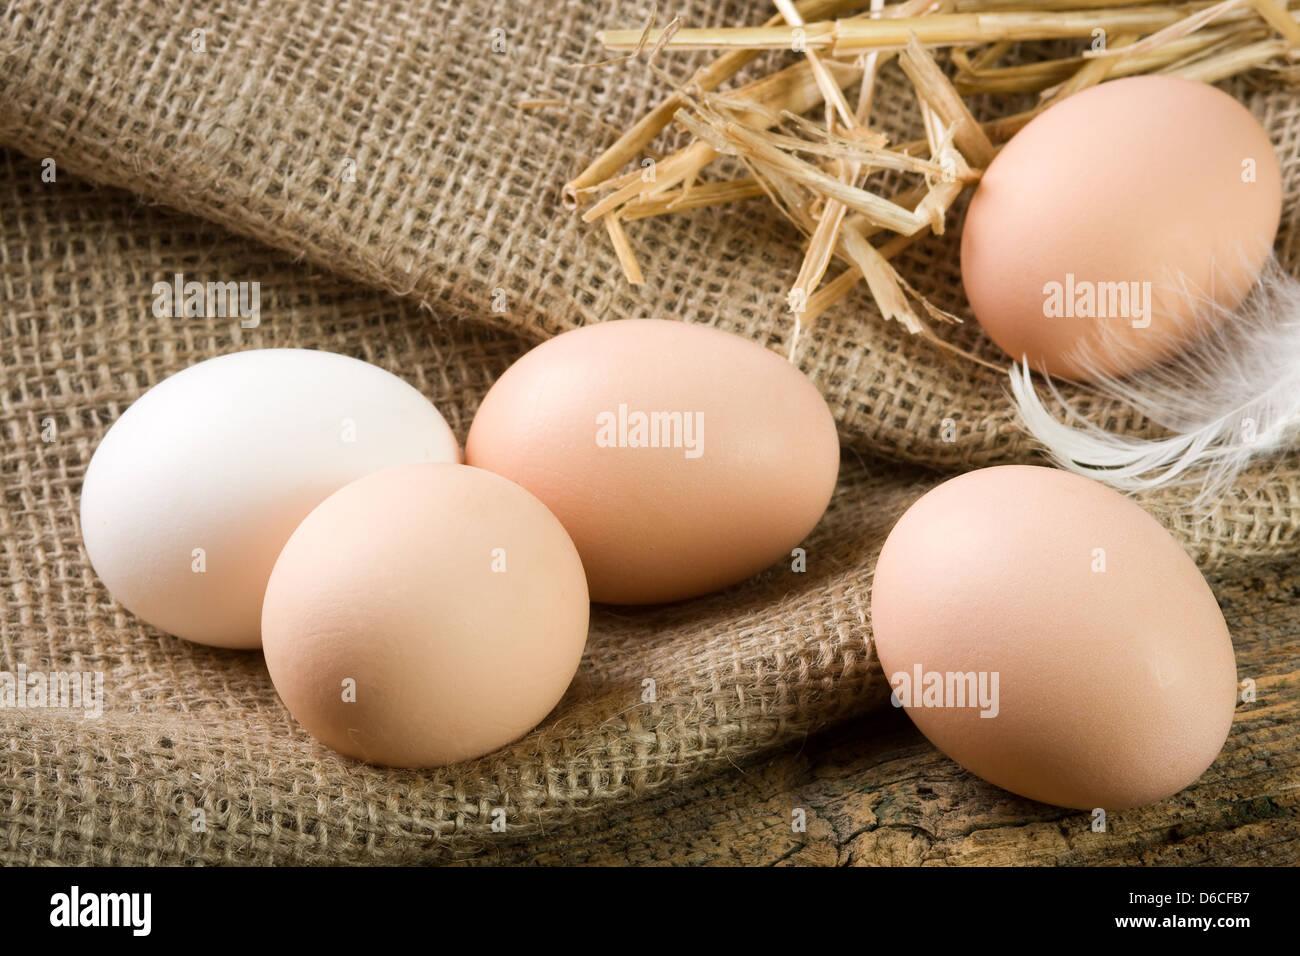 Fresh eggs from farm - Stock Image